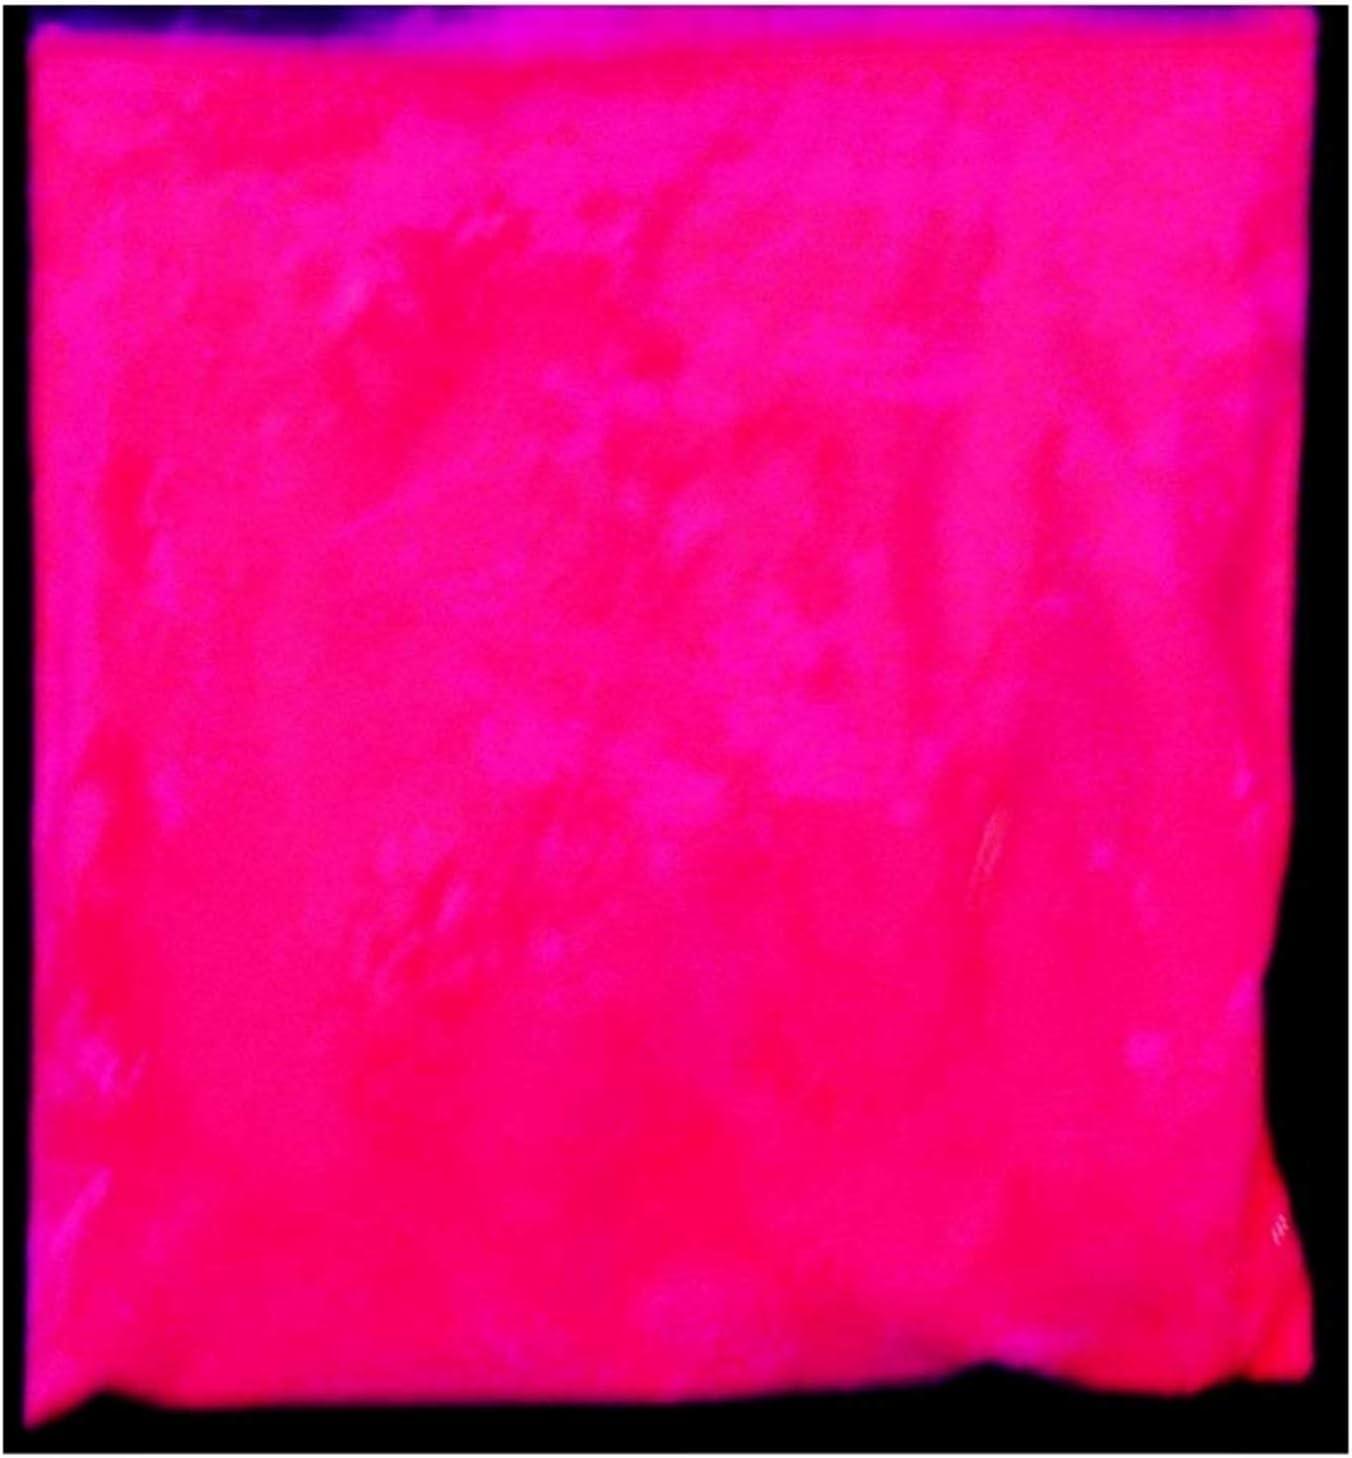 KIRALOVE Pigmento Fluorescente - tintes - Rosa Fucsia - Idea de Regalo Original - Brilla en Contacto con luz Negra - luz Ultravioleta - Polvo Fino de ...